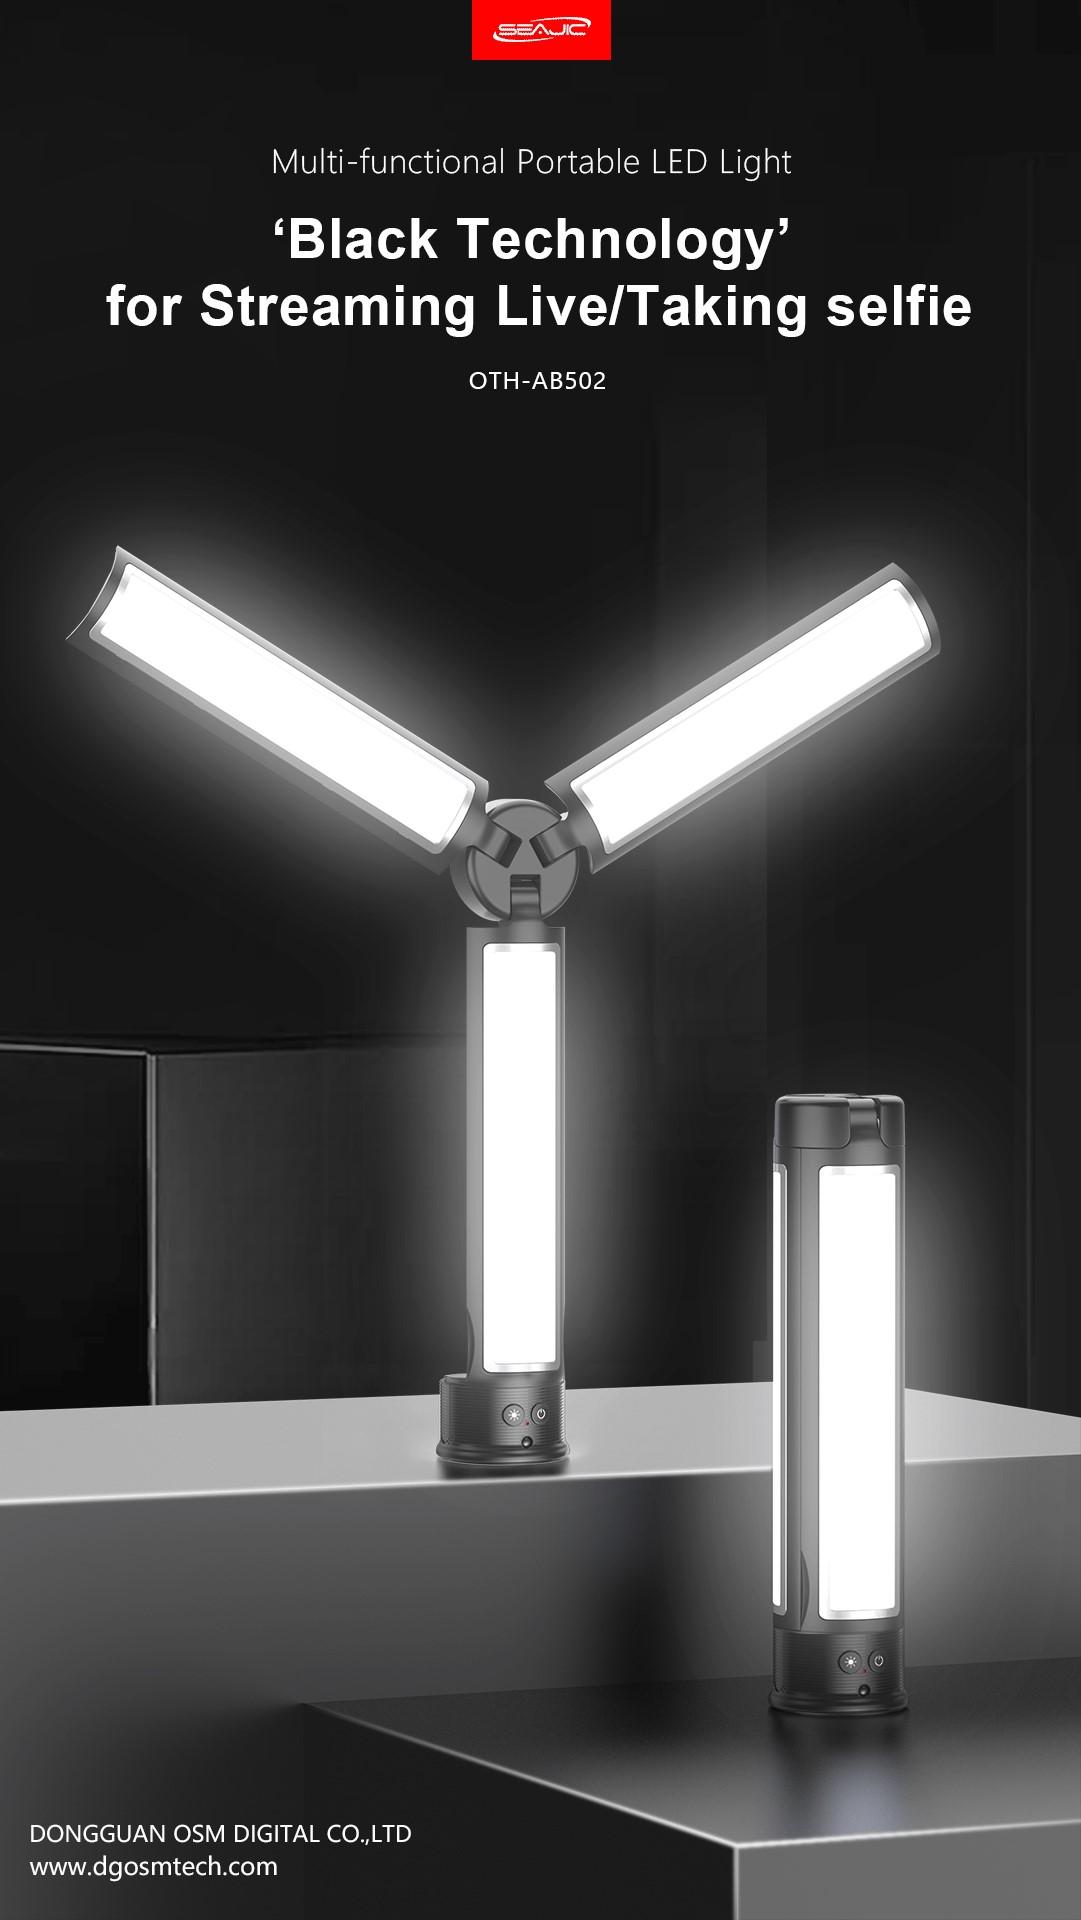 OTH-AB502 Partable Multi-functional Folding LED Light